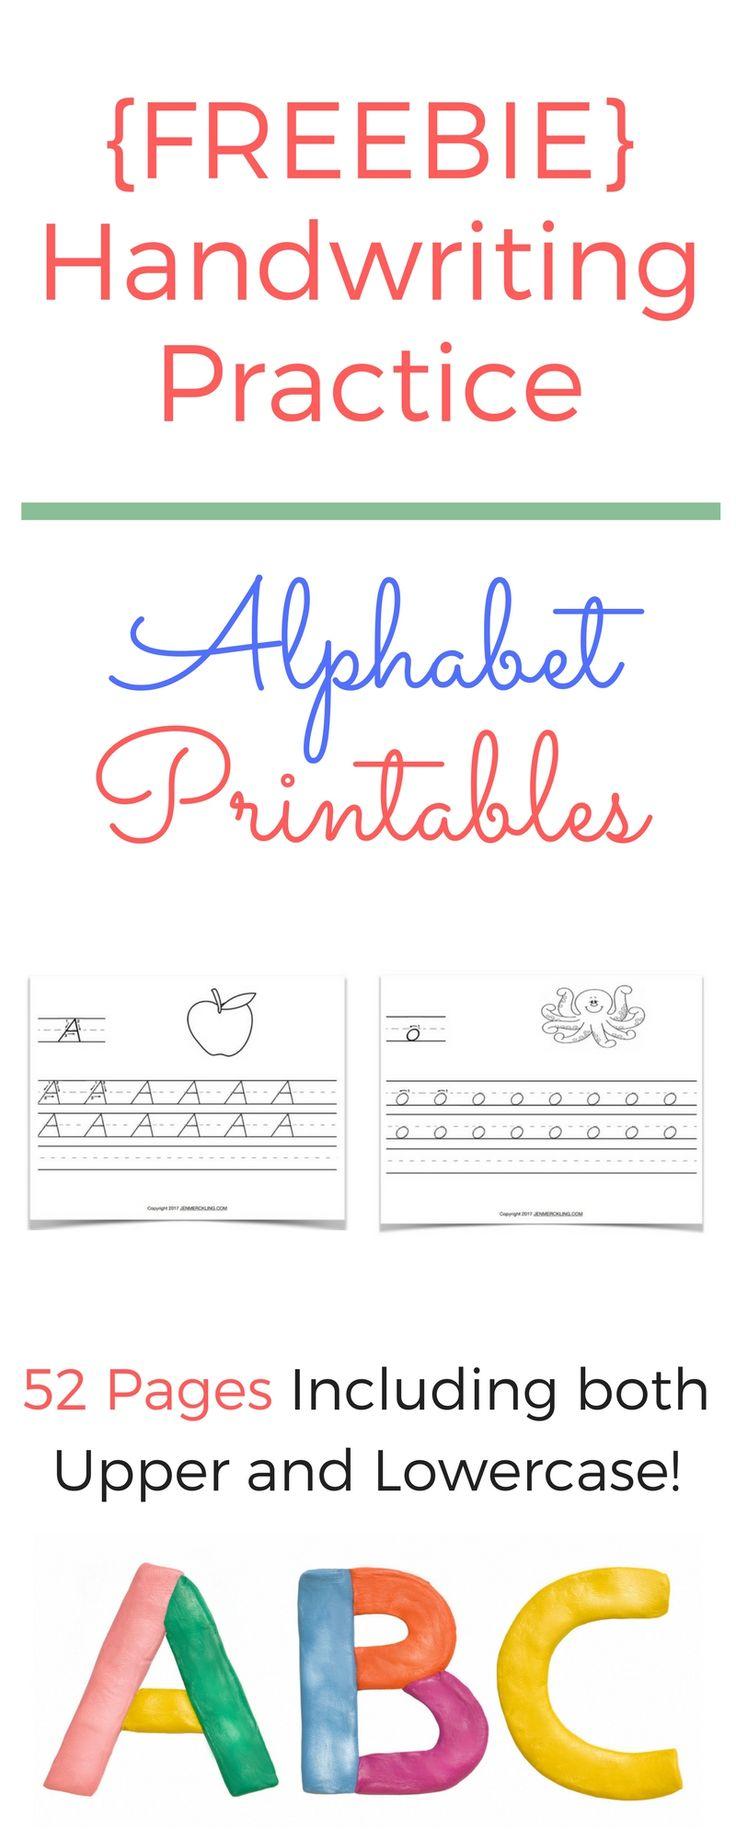 Free Handwriting Worksheets!